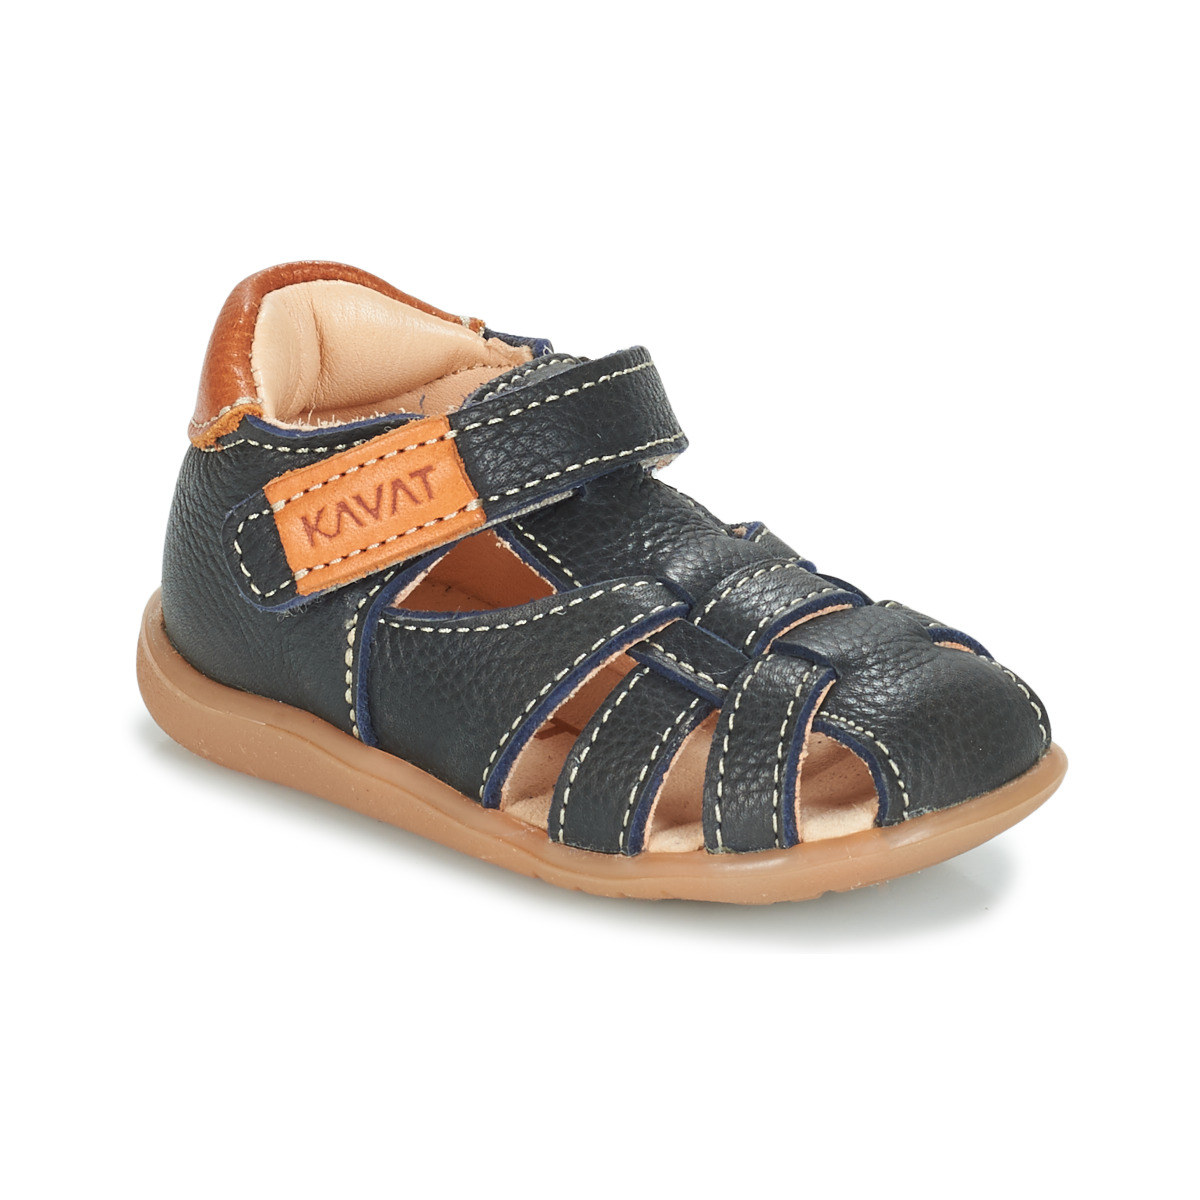 Sandale Kavat RULLSAND Bleu marine